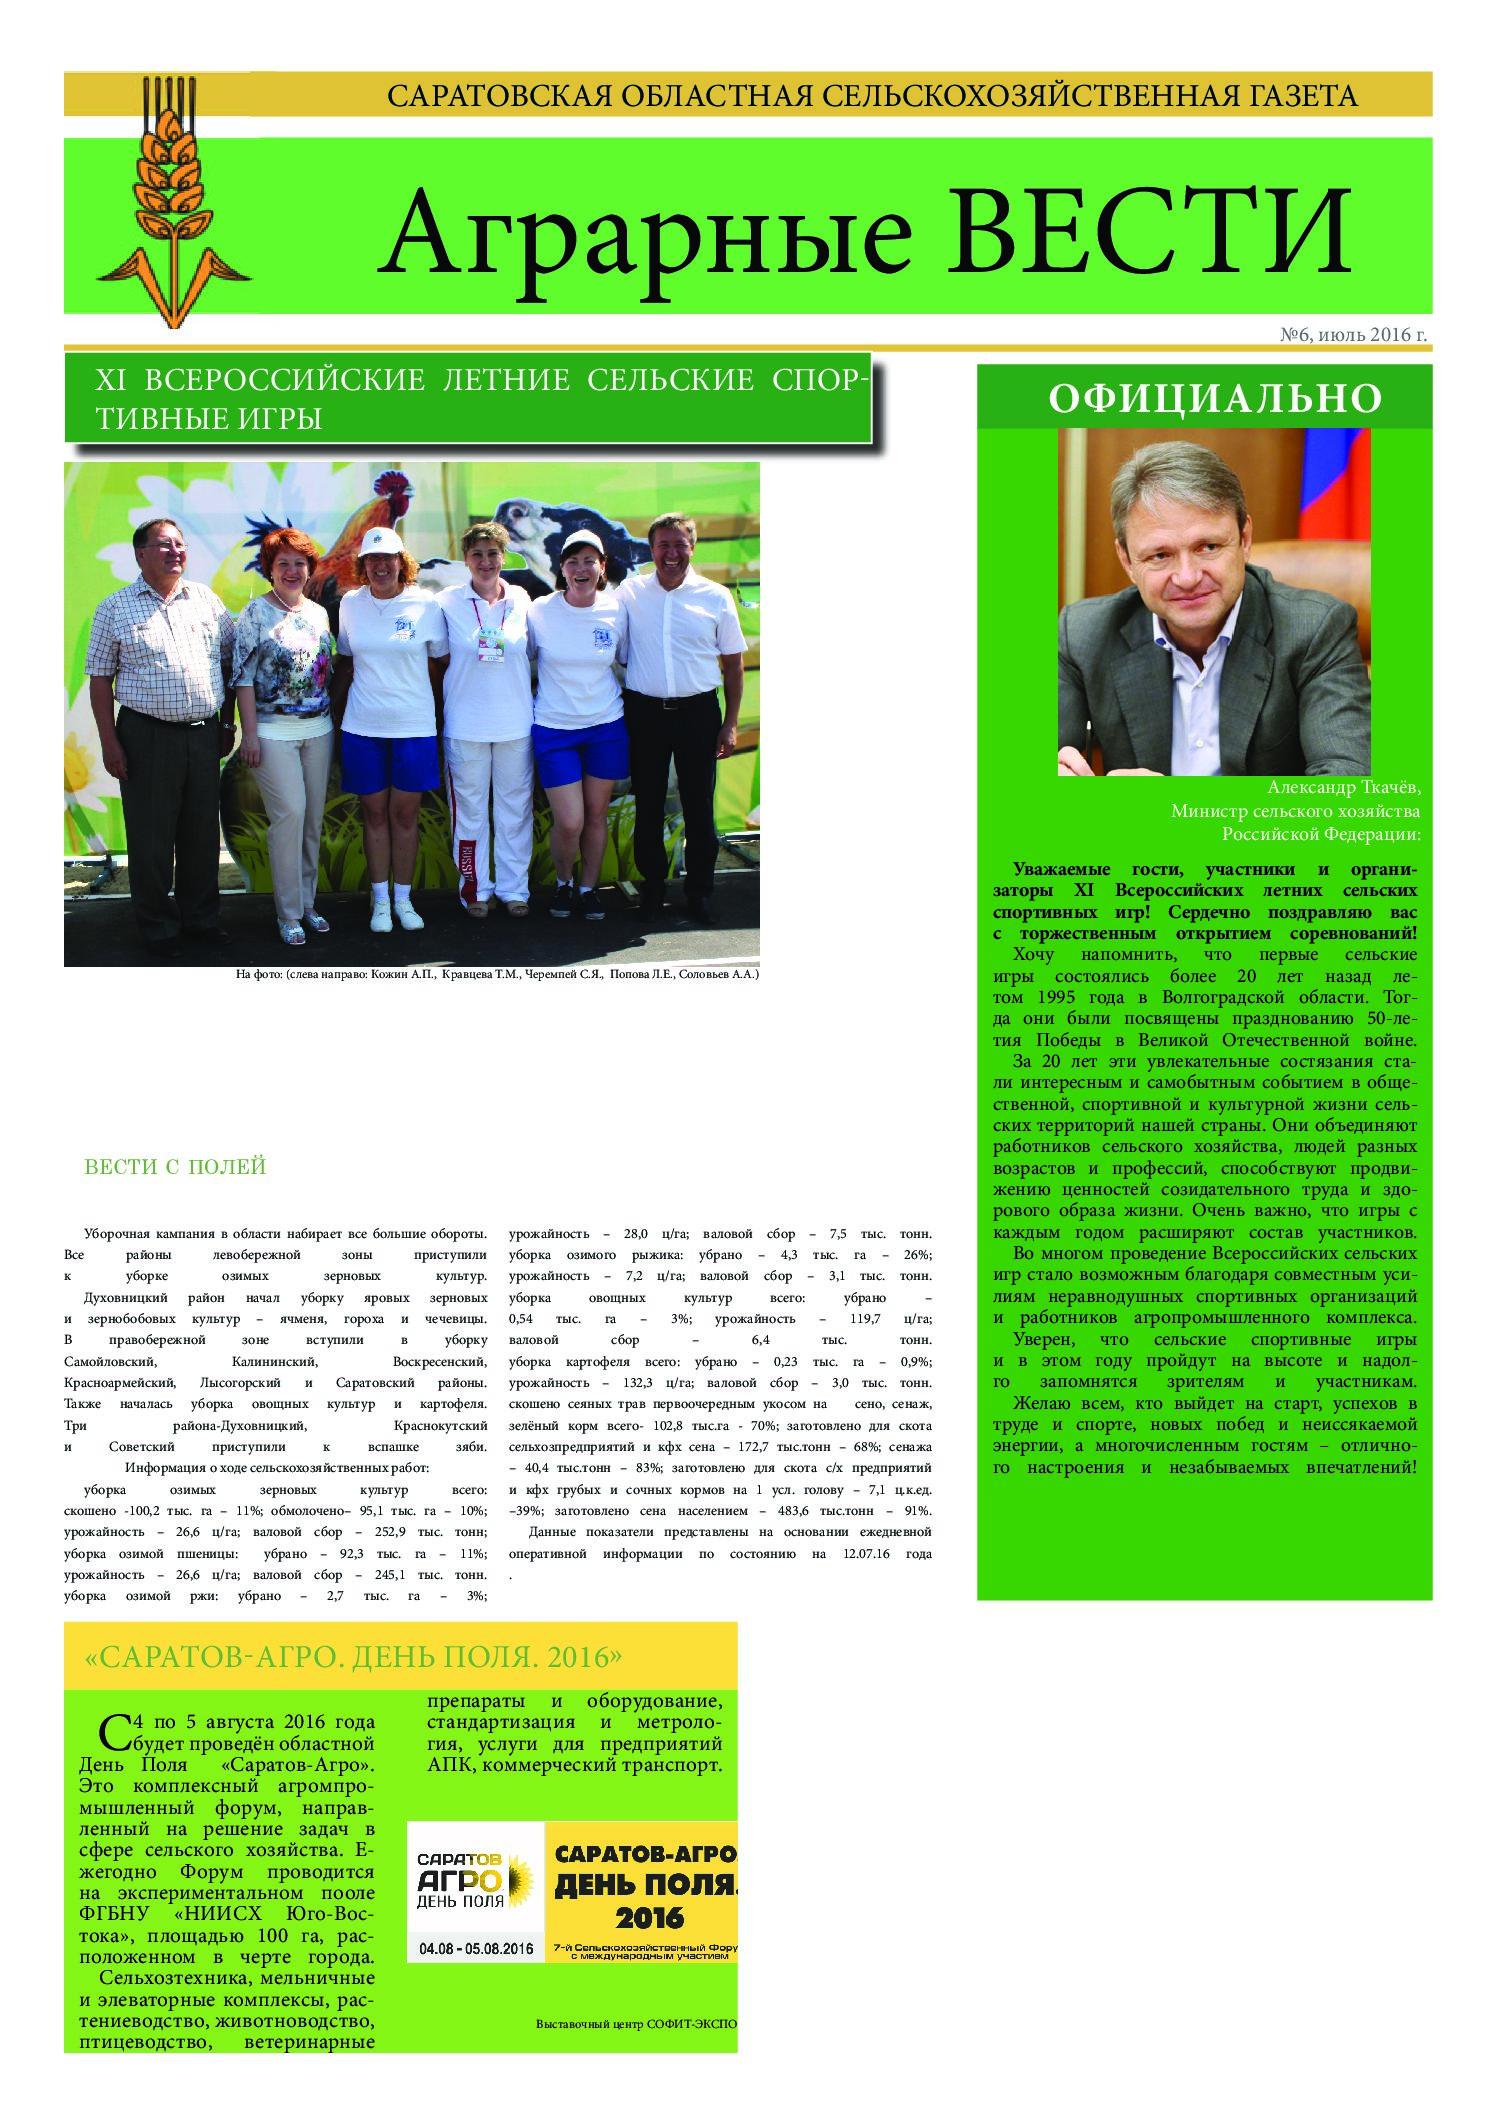 https://saratovagro.ru/wp-content/uploads/2020/08/июль-1-pdf.jpg